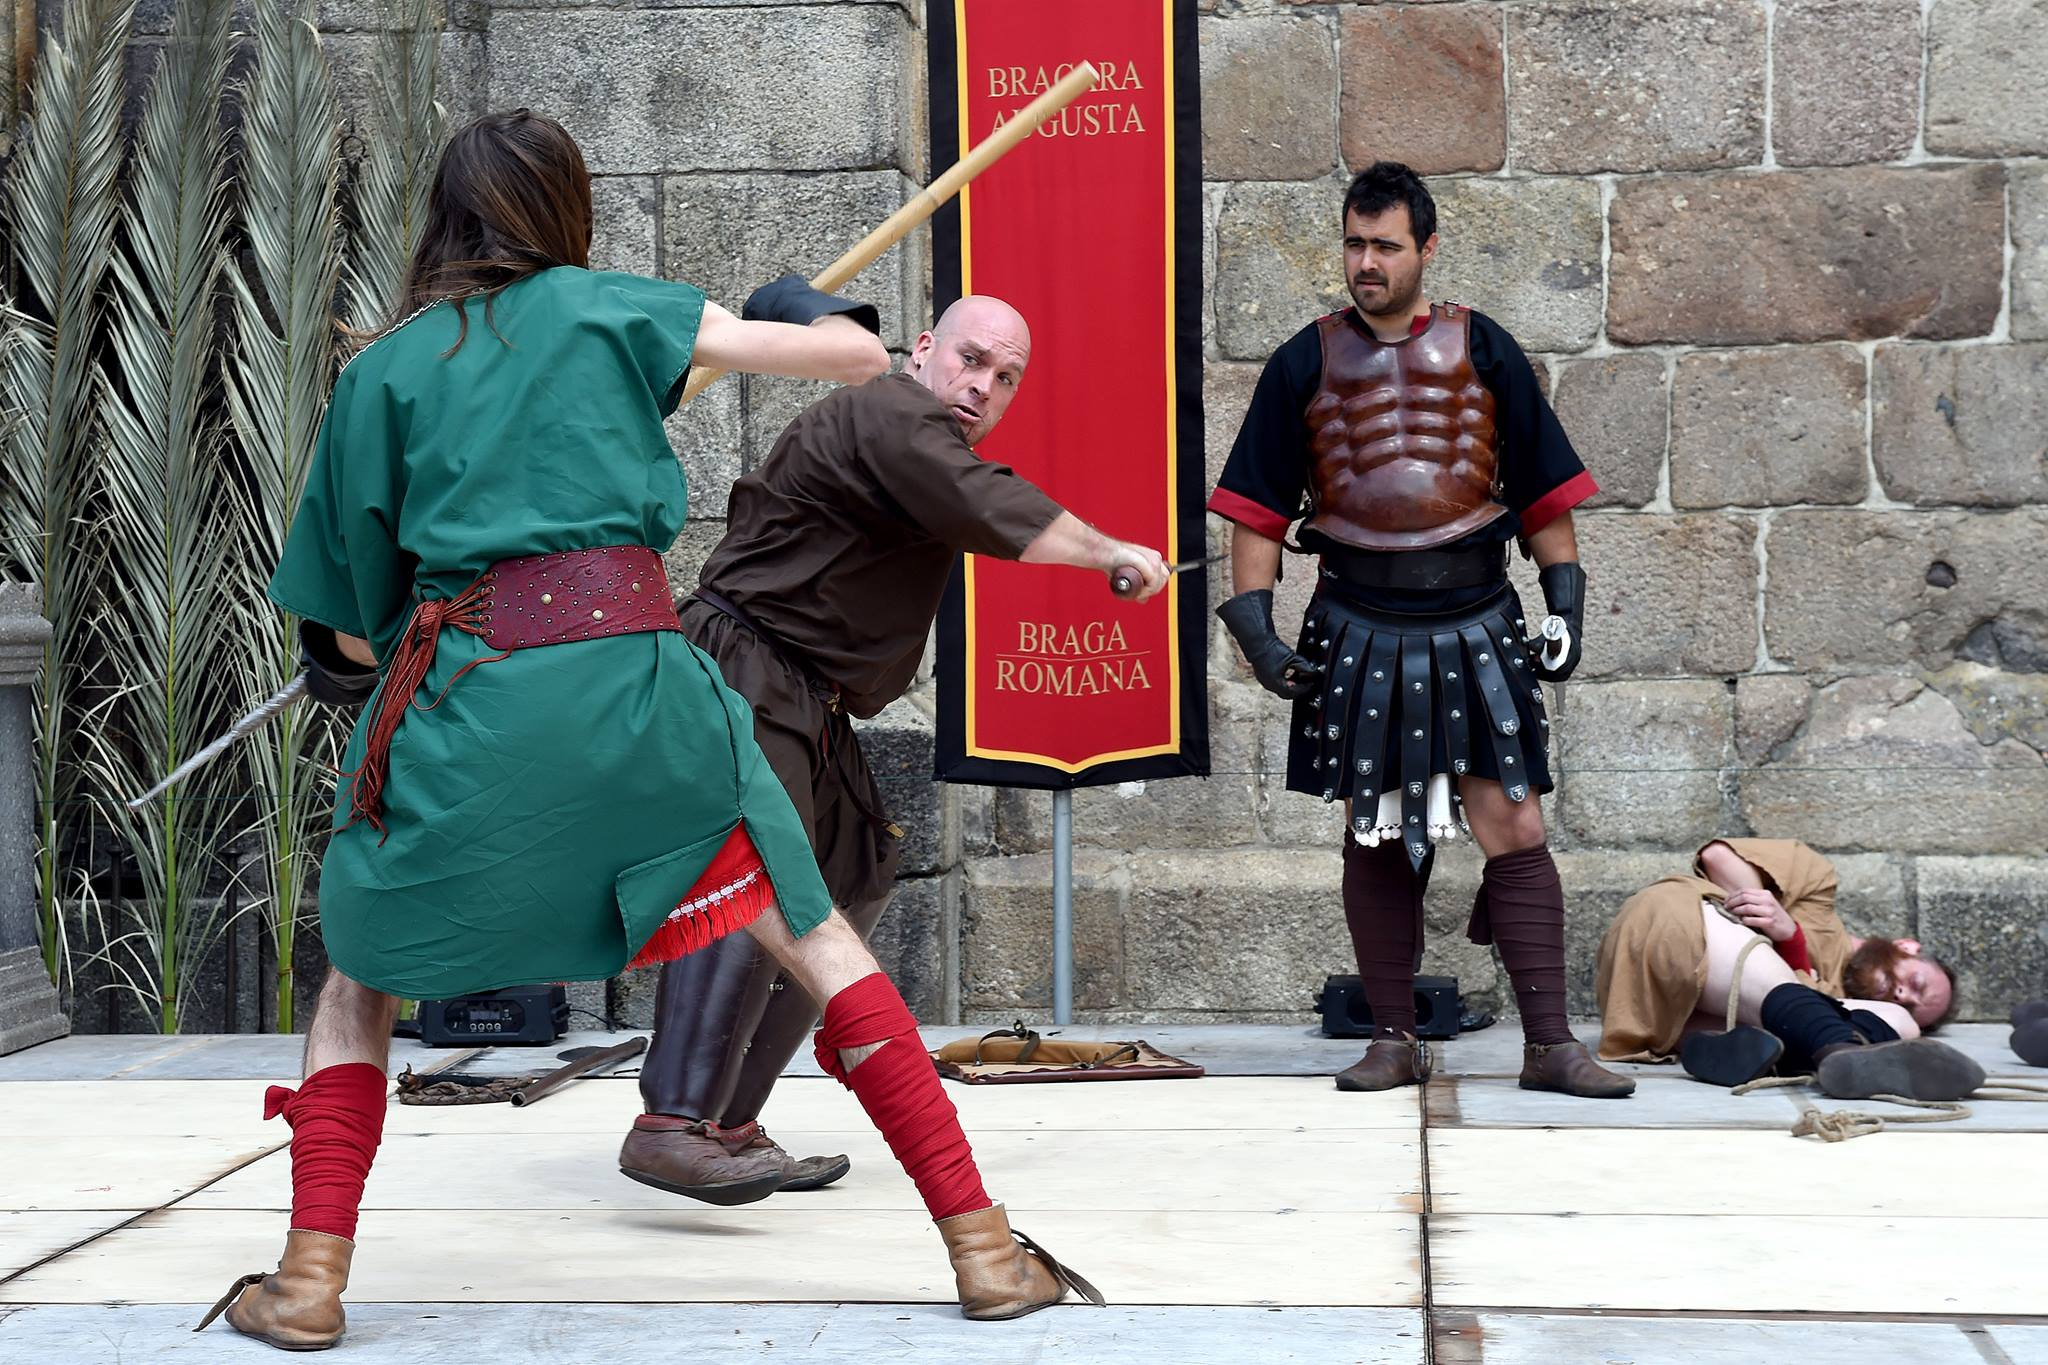 combate-gladiadores-braga-romana-2017-bracara-augusta